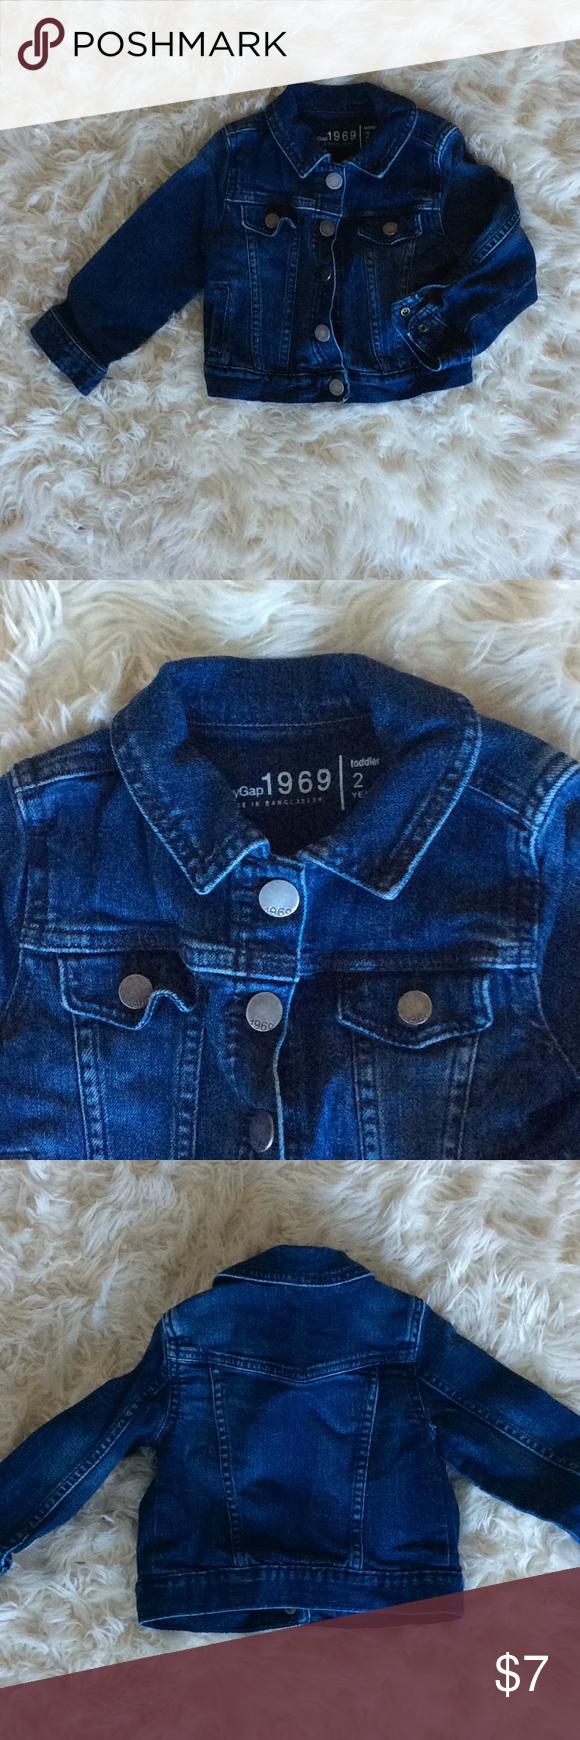 5 25 Baby Gap 1969 Jean Jacket Dark Wash Size 2 Jean Jacket Jackets Baby Gap [ 1740 x 580 Pixel ]